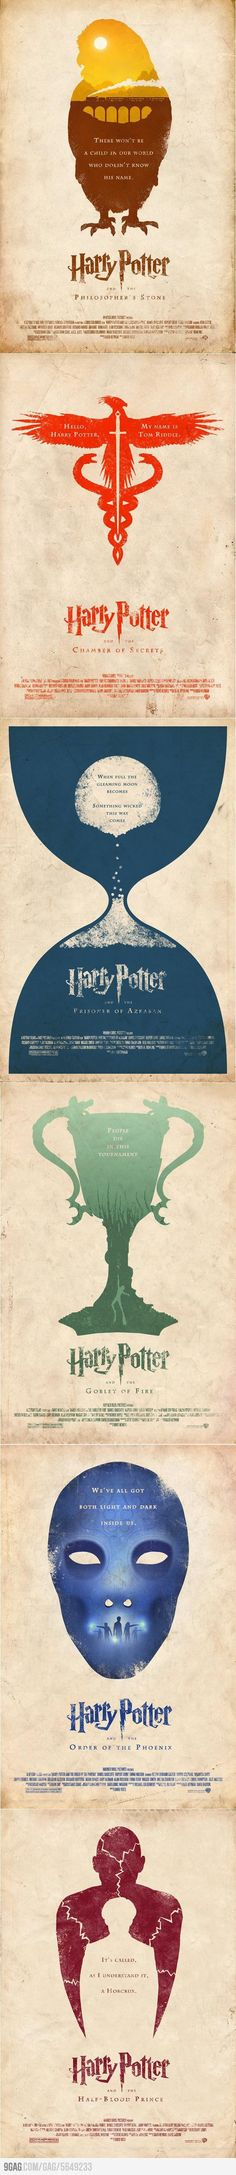 minimalistic Harry Potter books covers